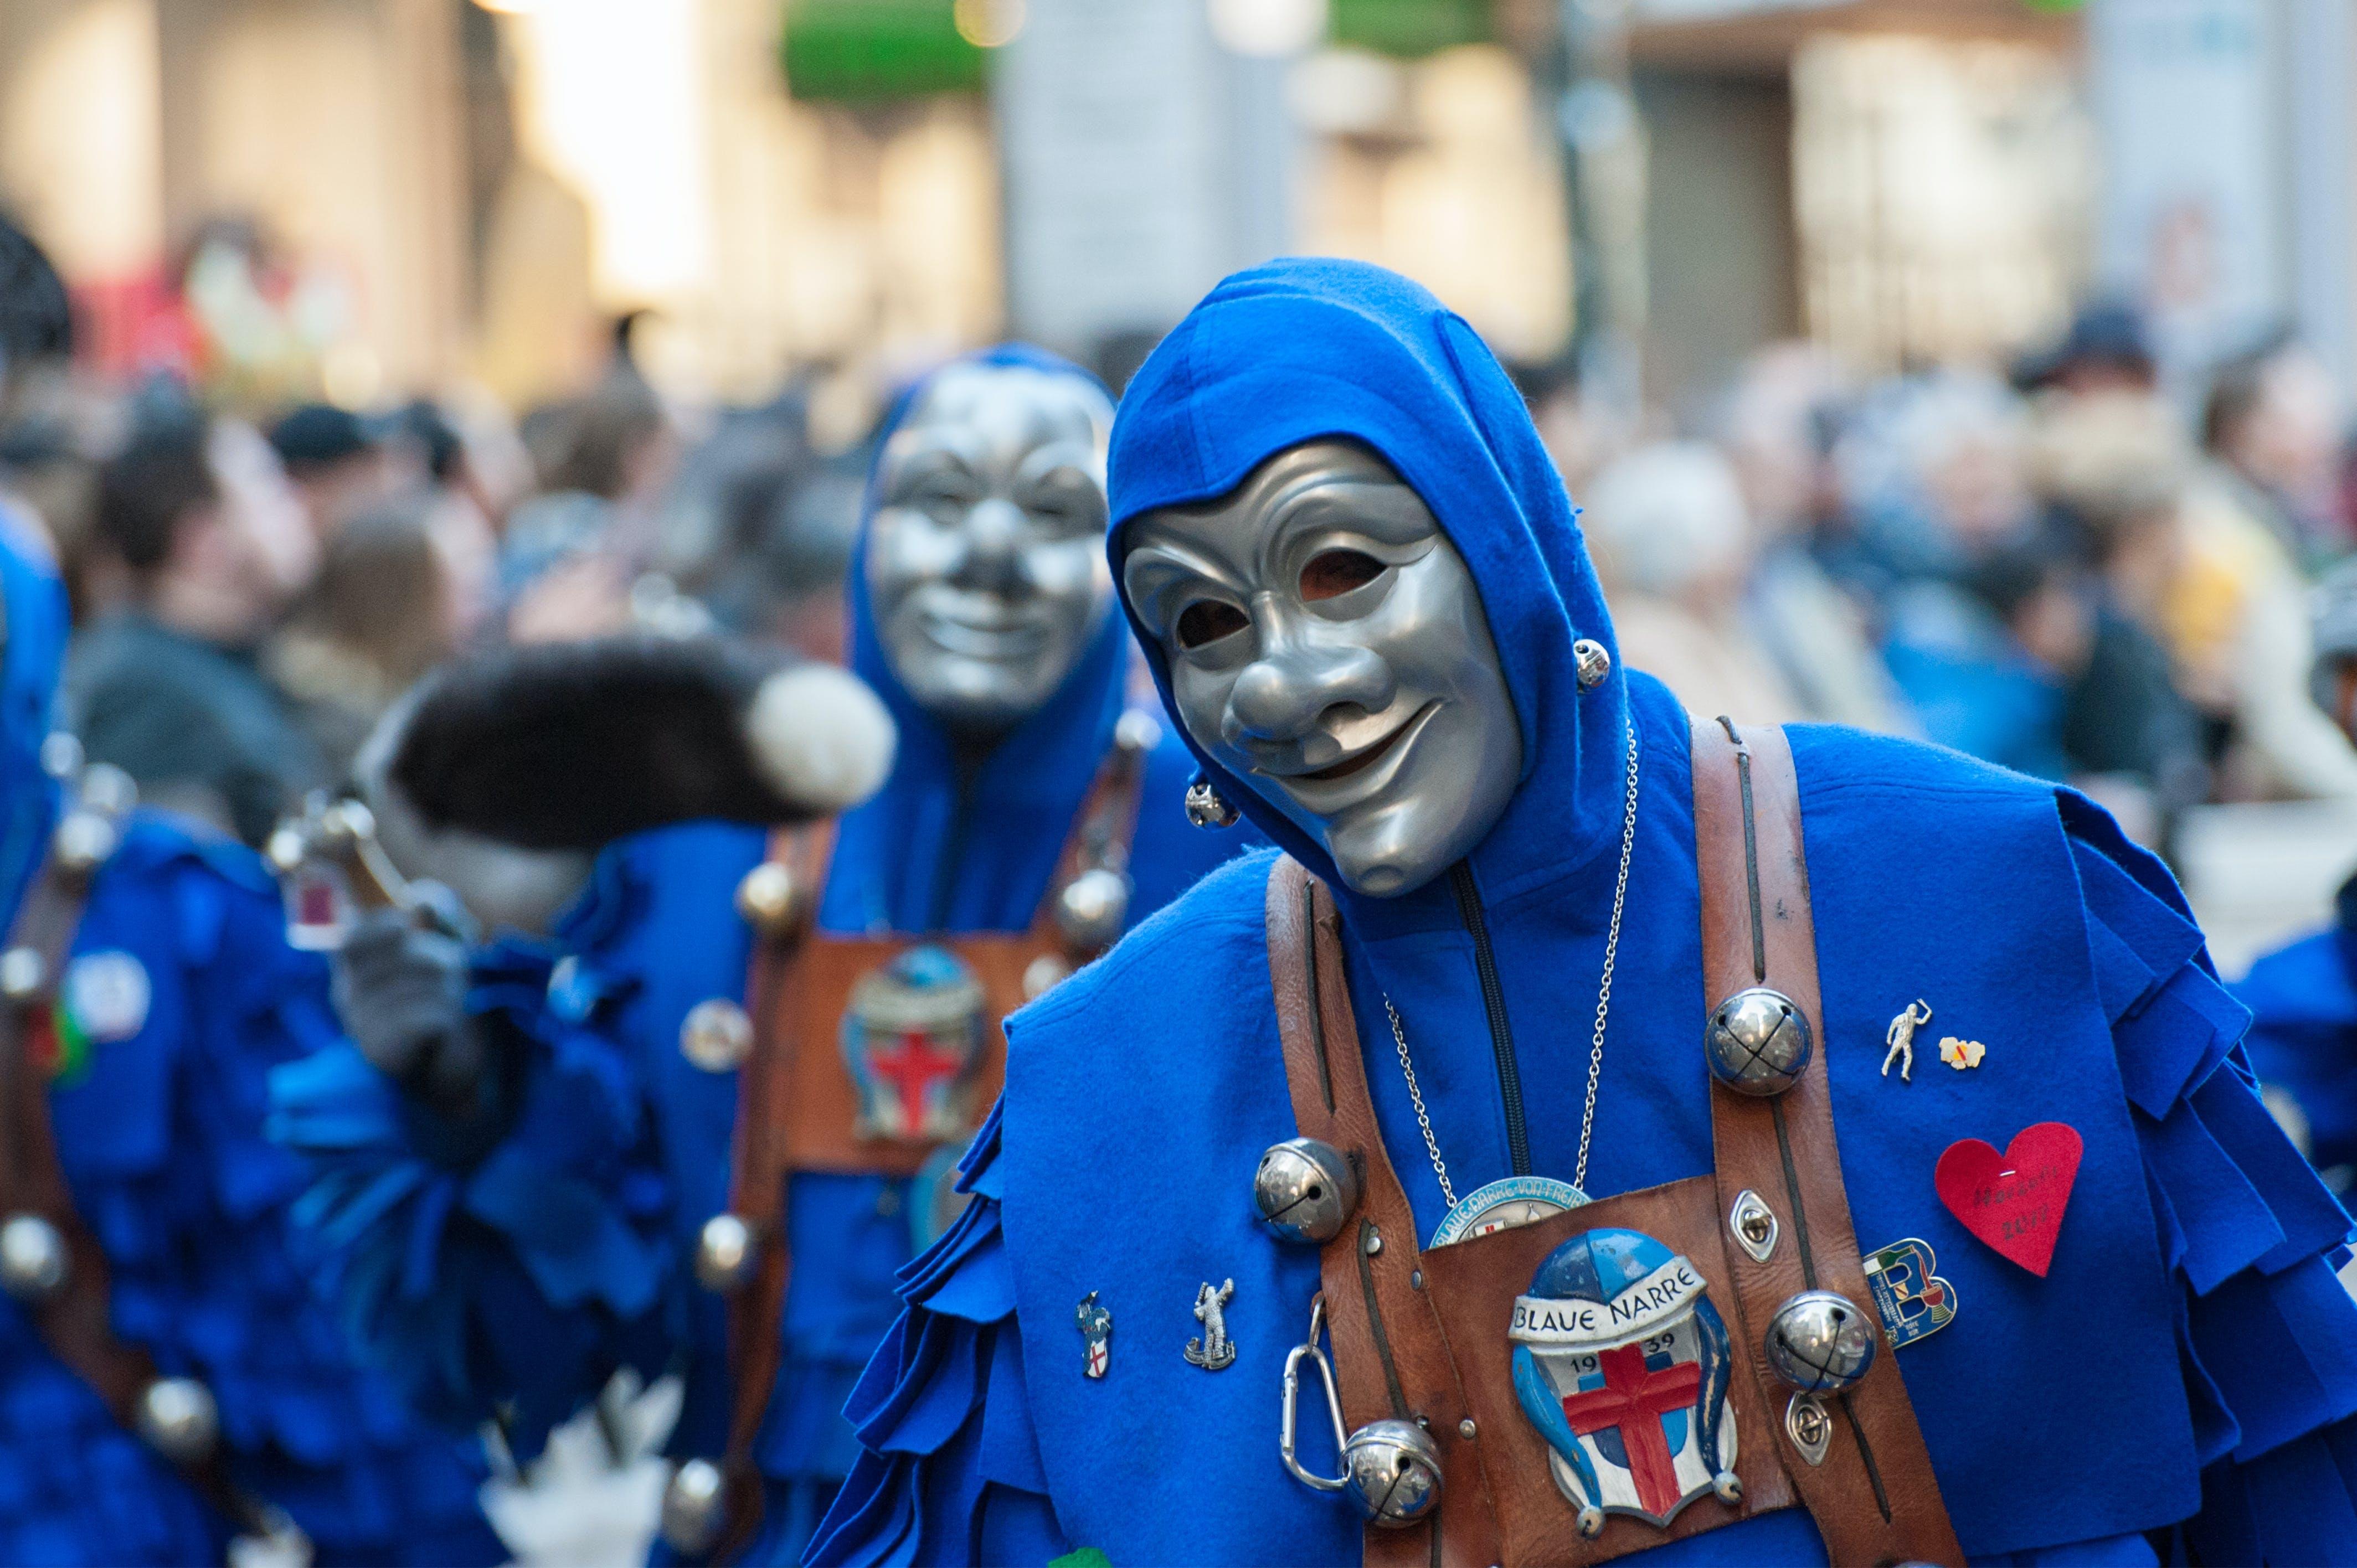 carnival, celebration, ceremony